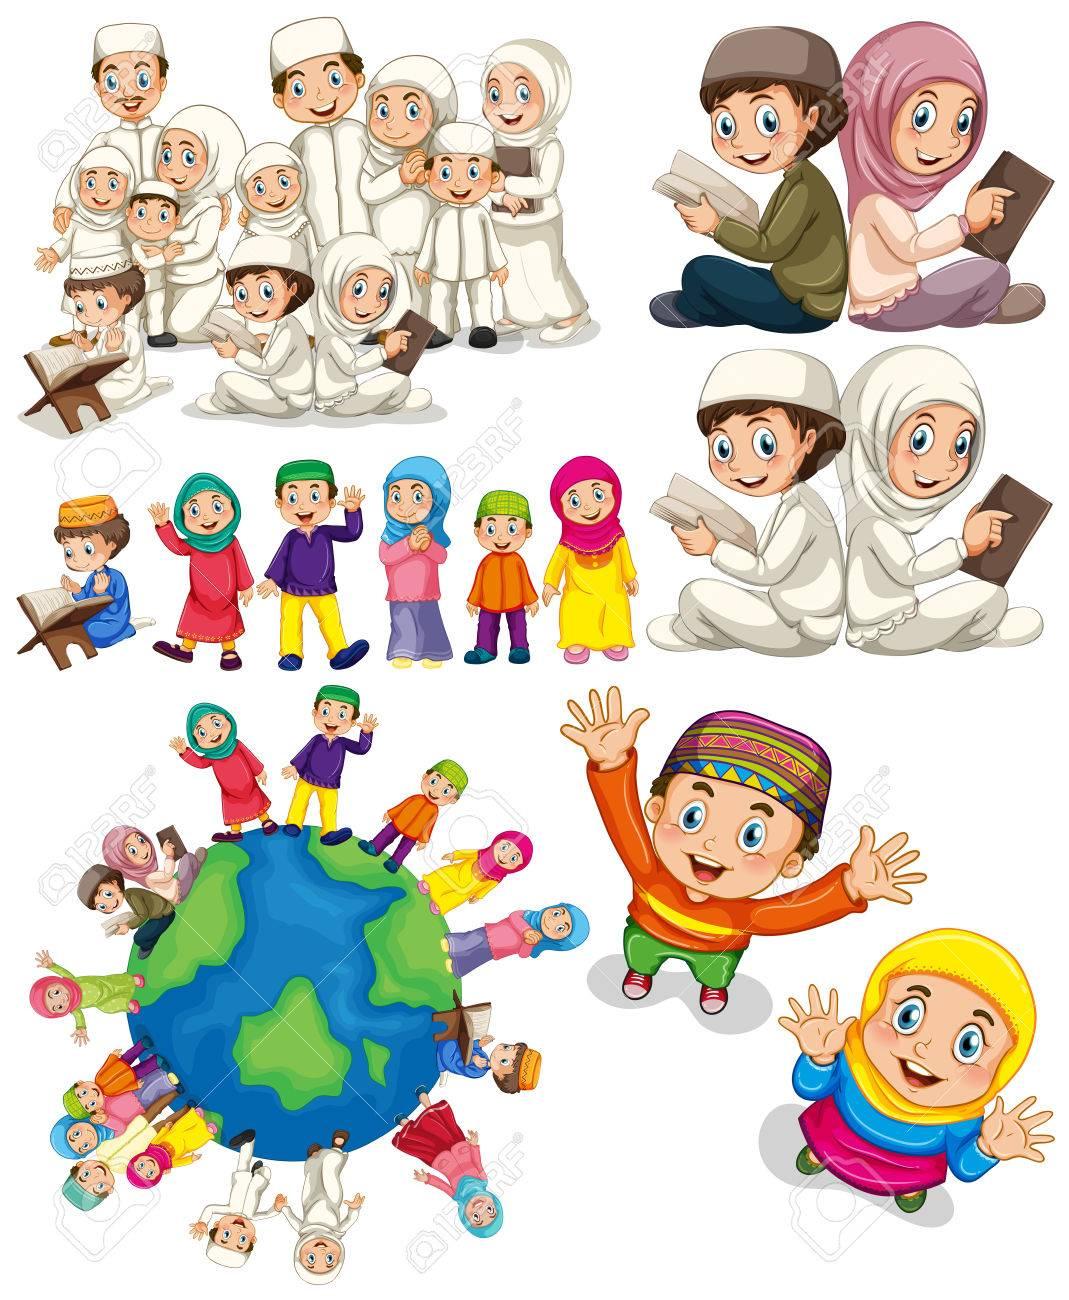 Muslim Families Around The World Illustration Royalty Free ...